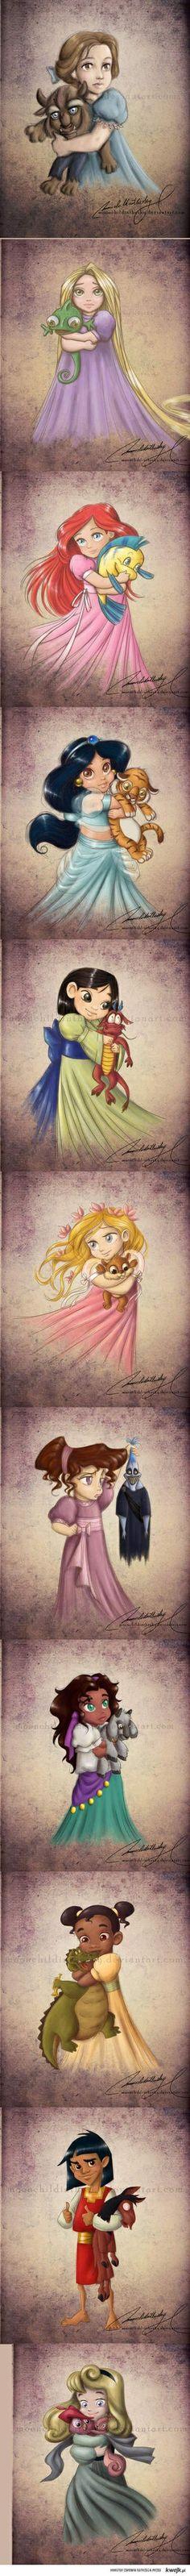 Disney princesses as kids